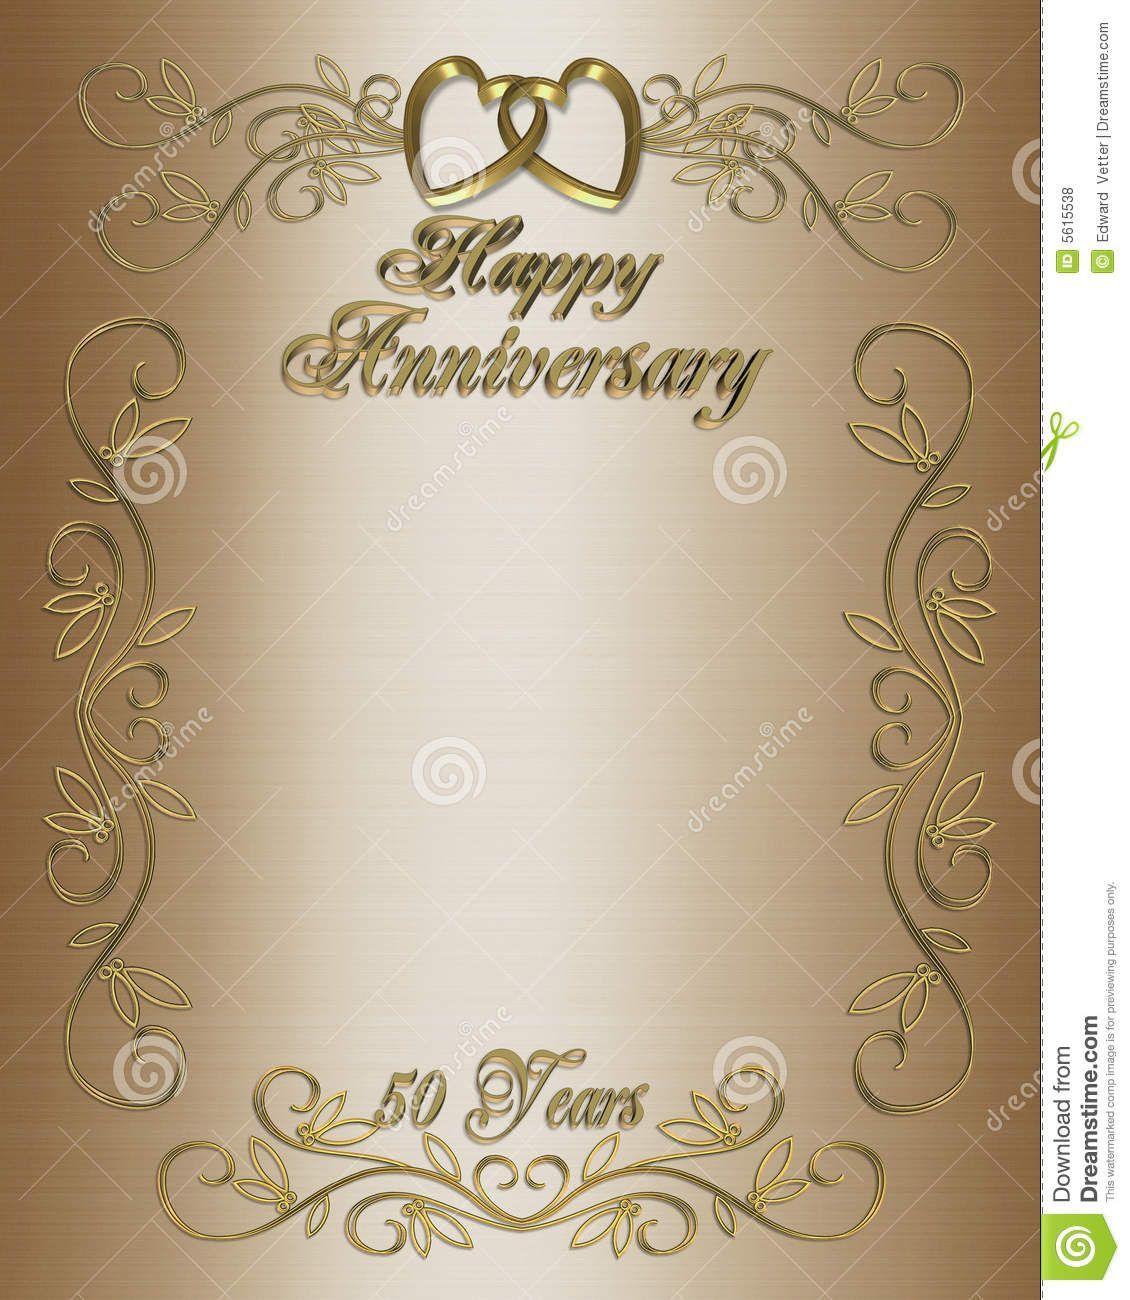 003 Striking 50th Anniversary Invitation Card Template Design  Templates FreeFull